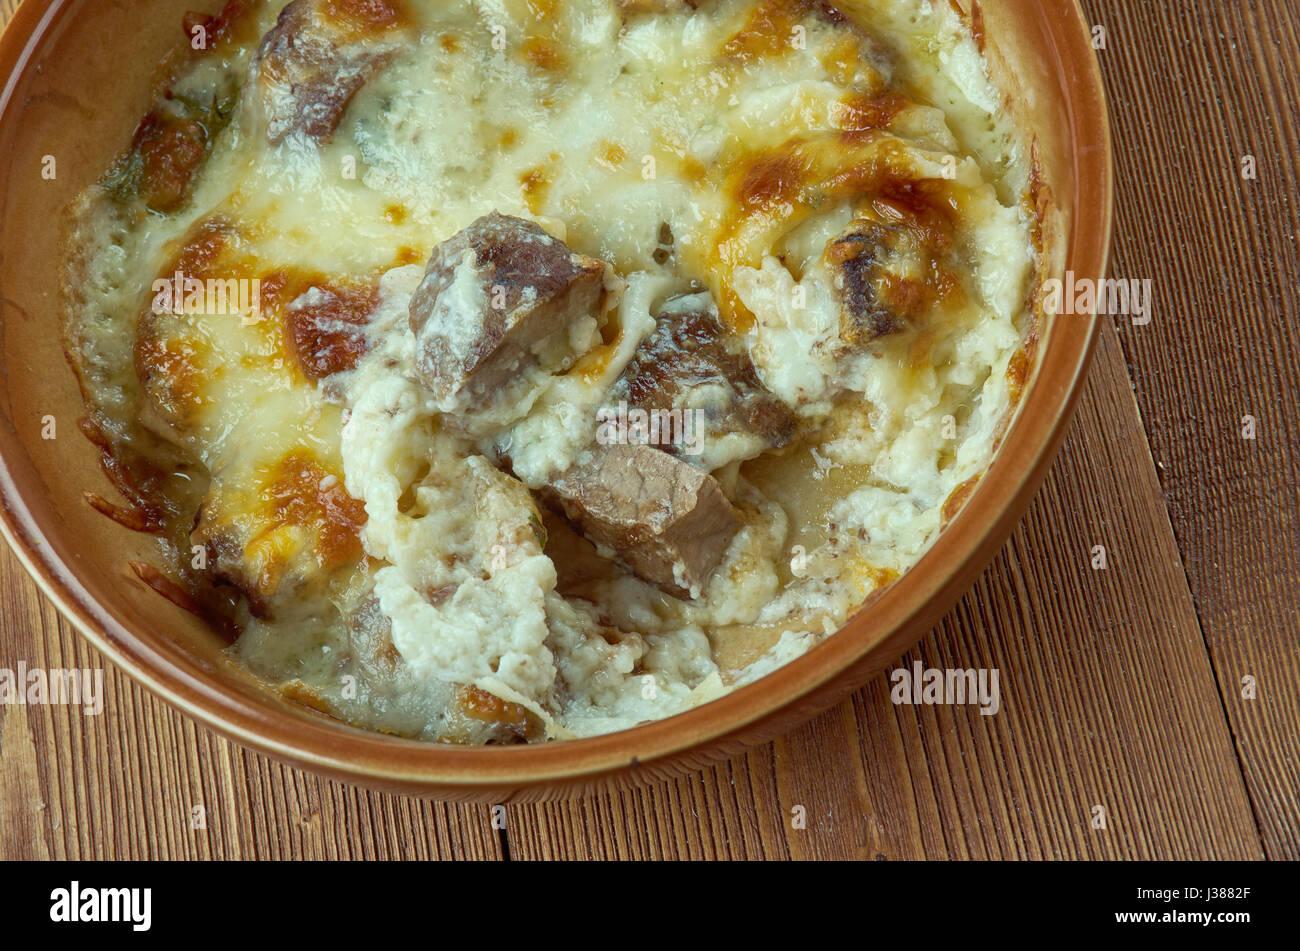 Elbasan tava - Baked lamb in yogurt.Albanian cuisine - Stock Image